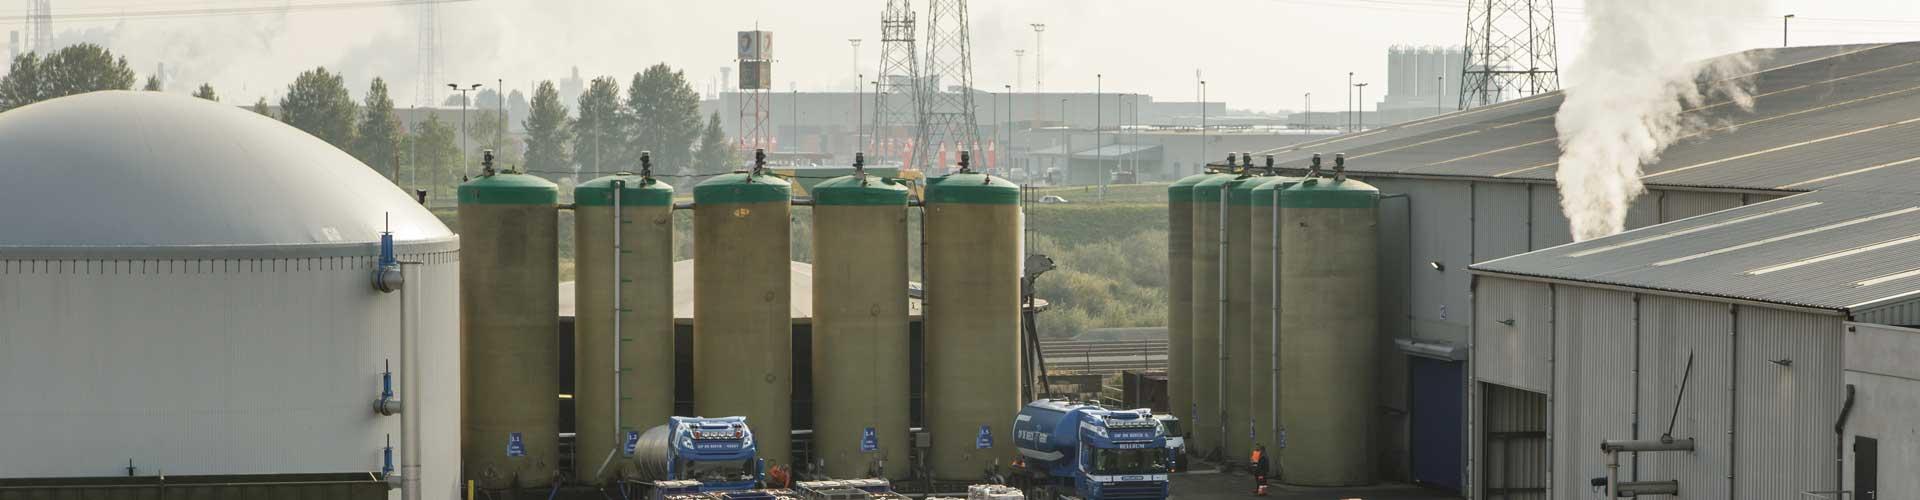 Group Op de Beeck - Kallo - Biogasinstallatie